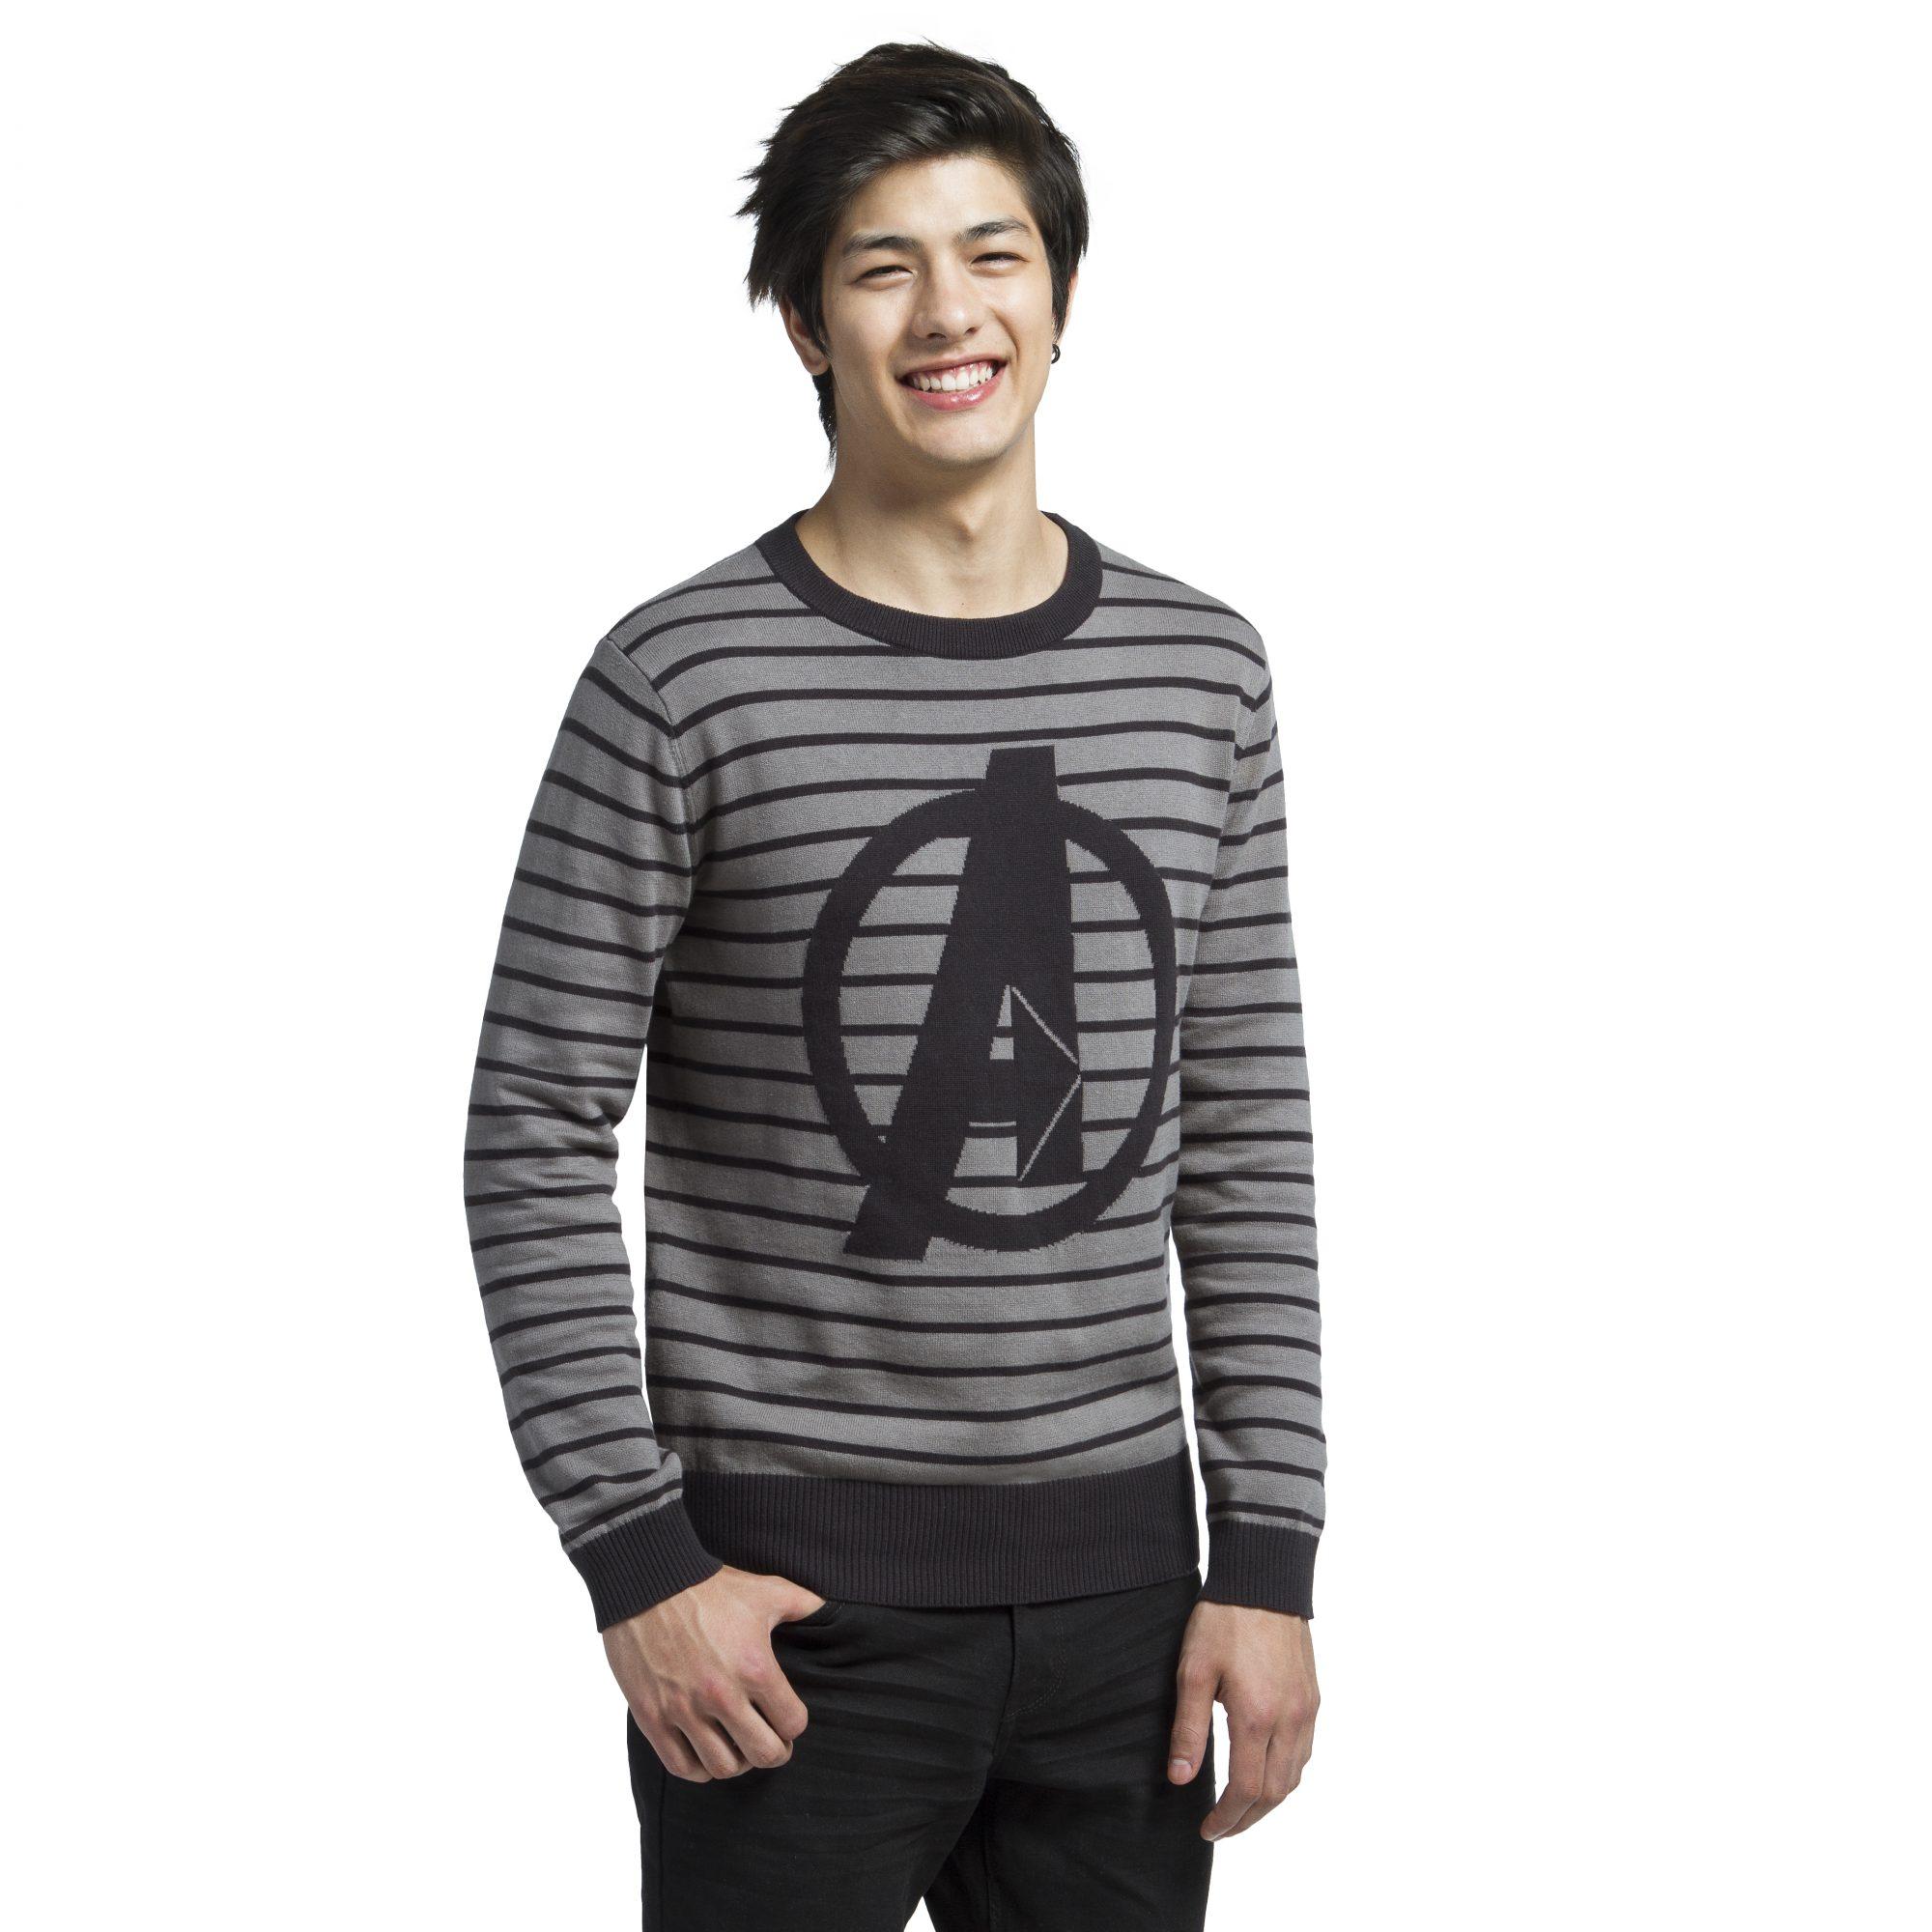 kgot_avengers_sweater_mb.jpg